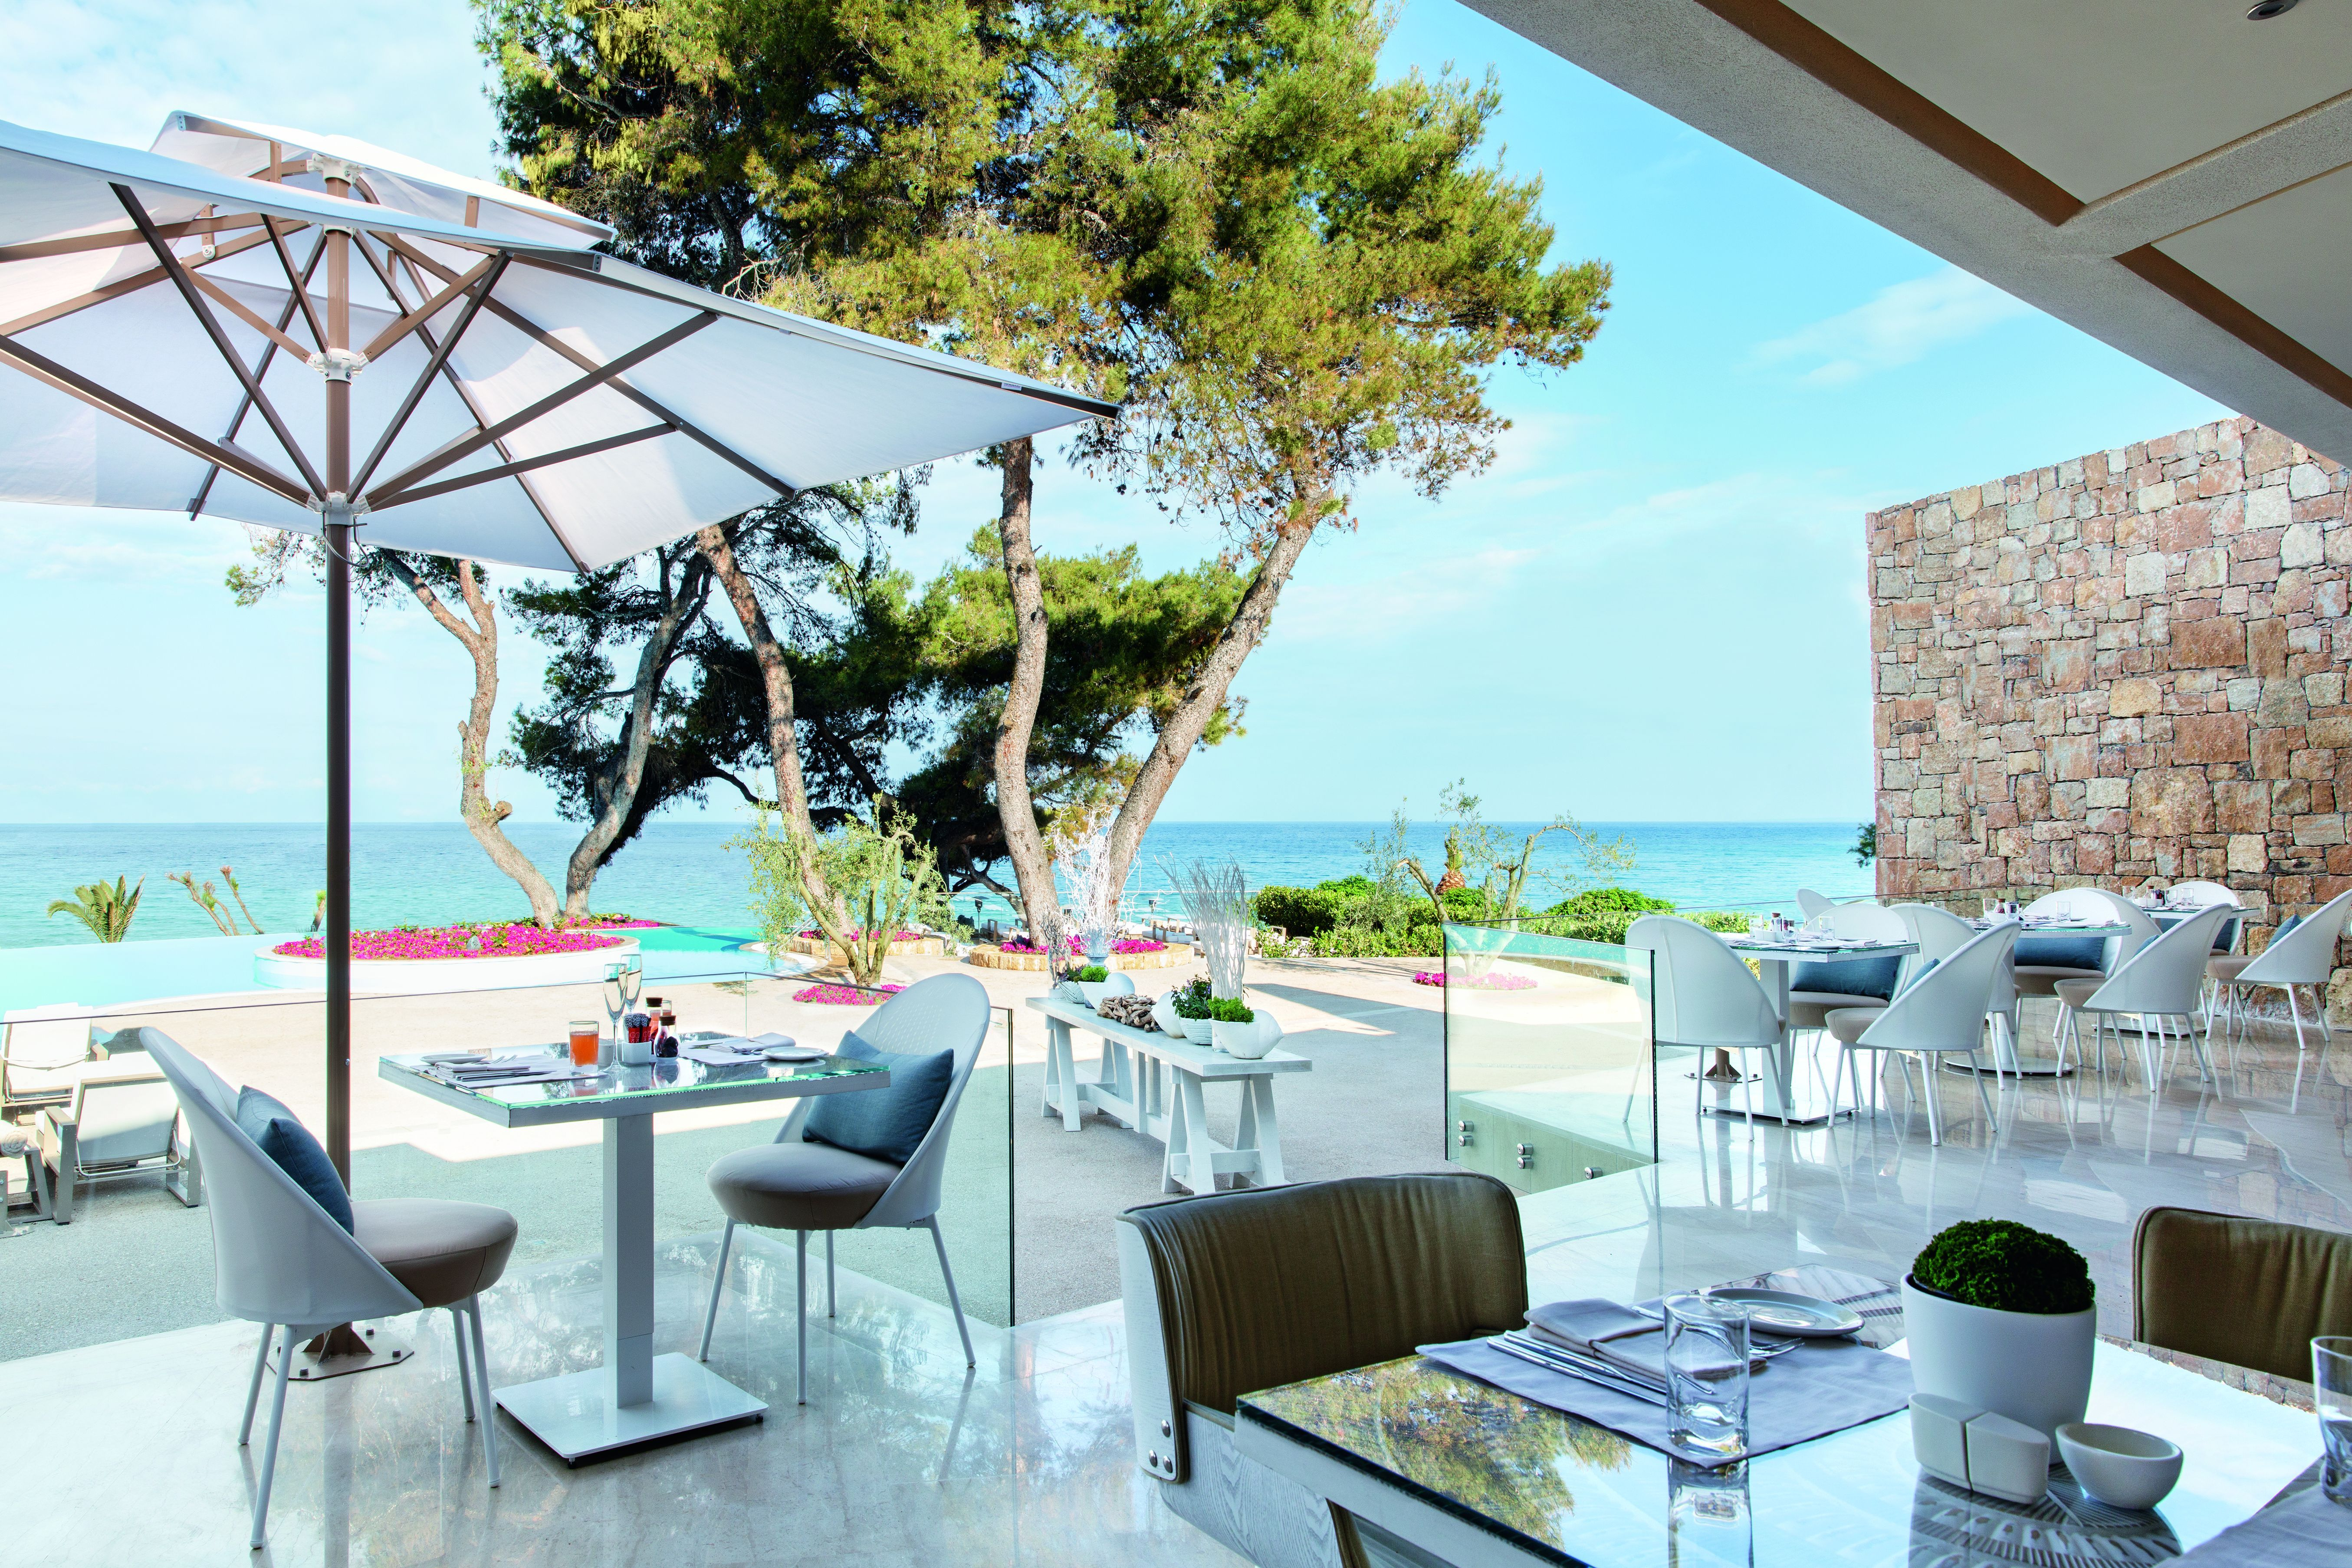 Dine Around 'the world' in Sani Resort